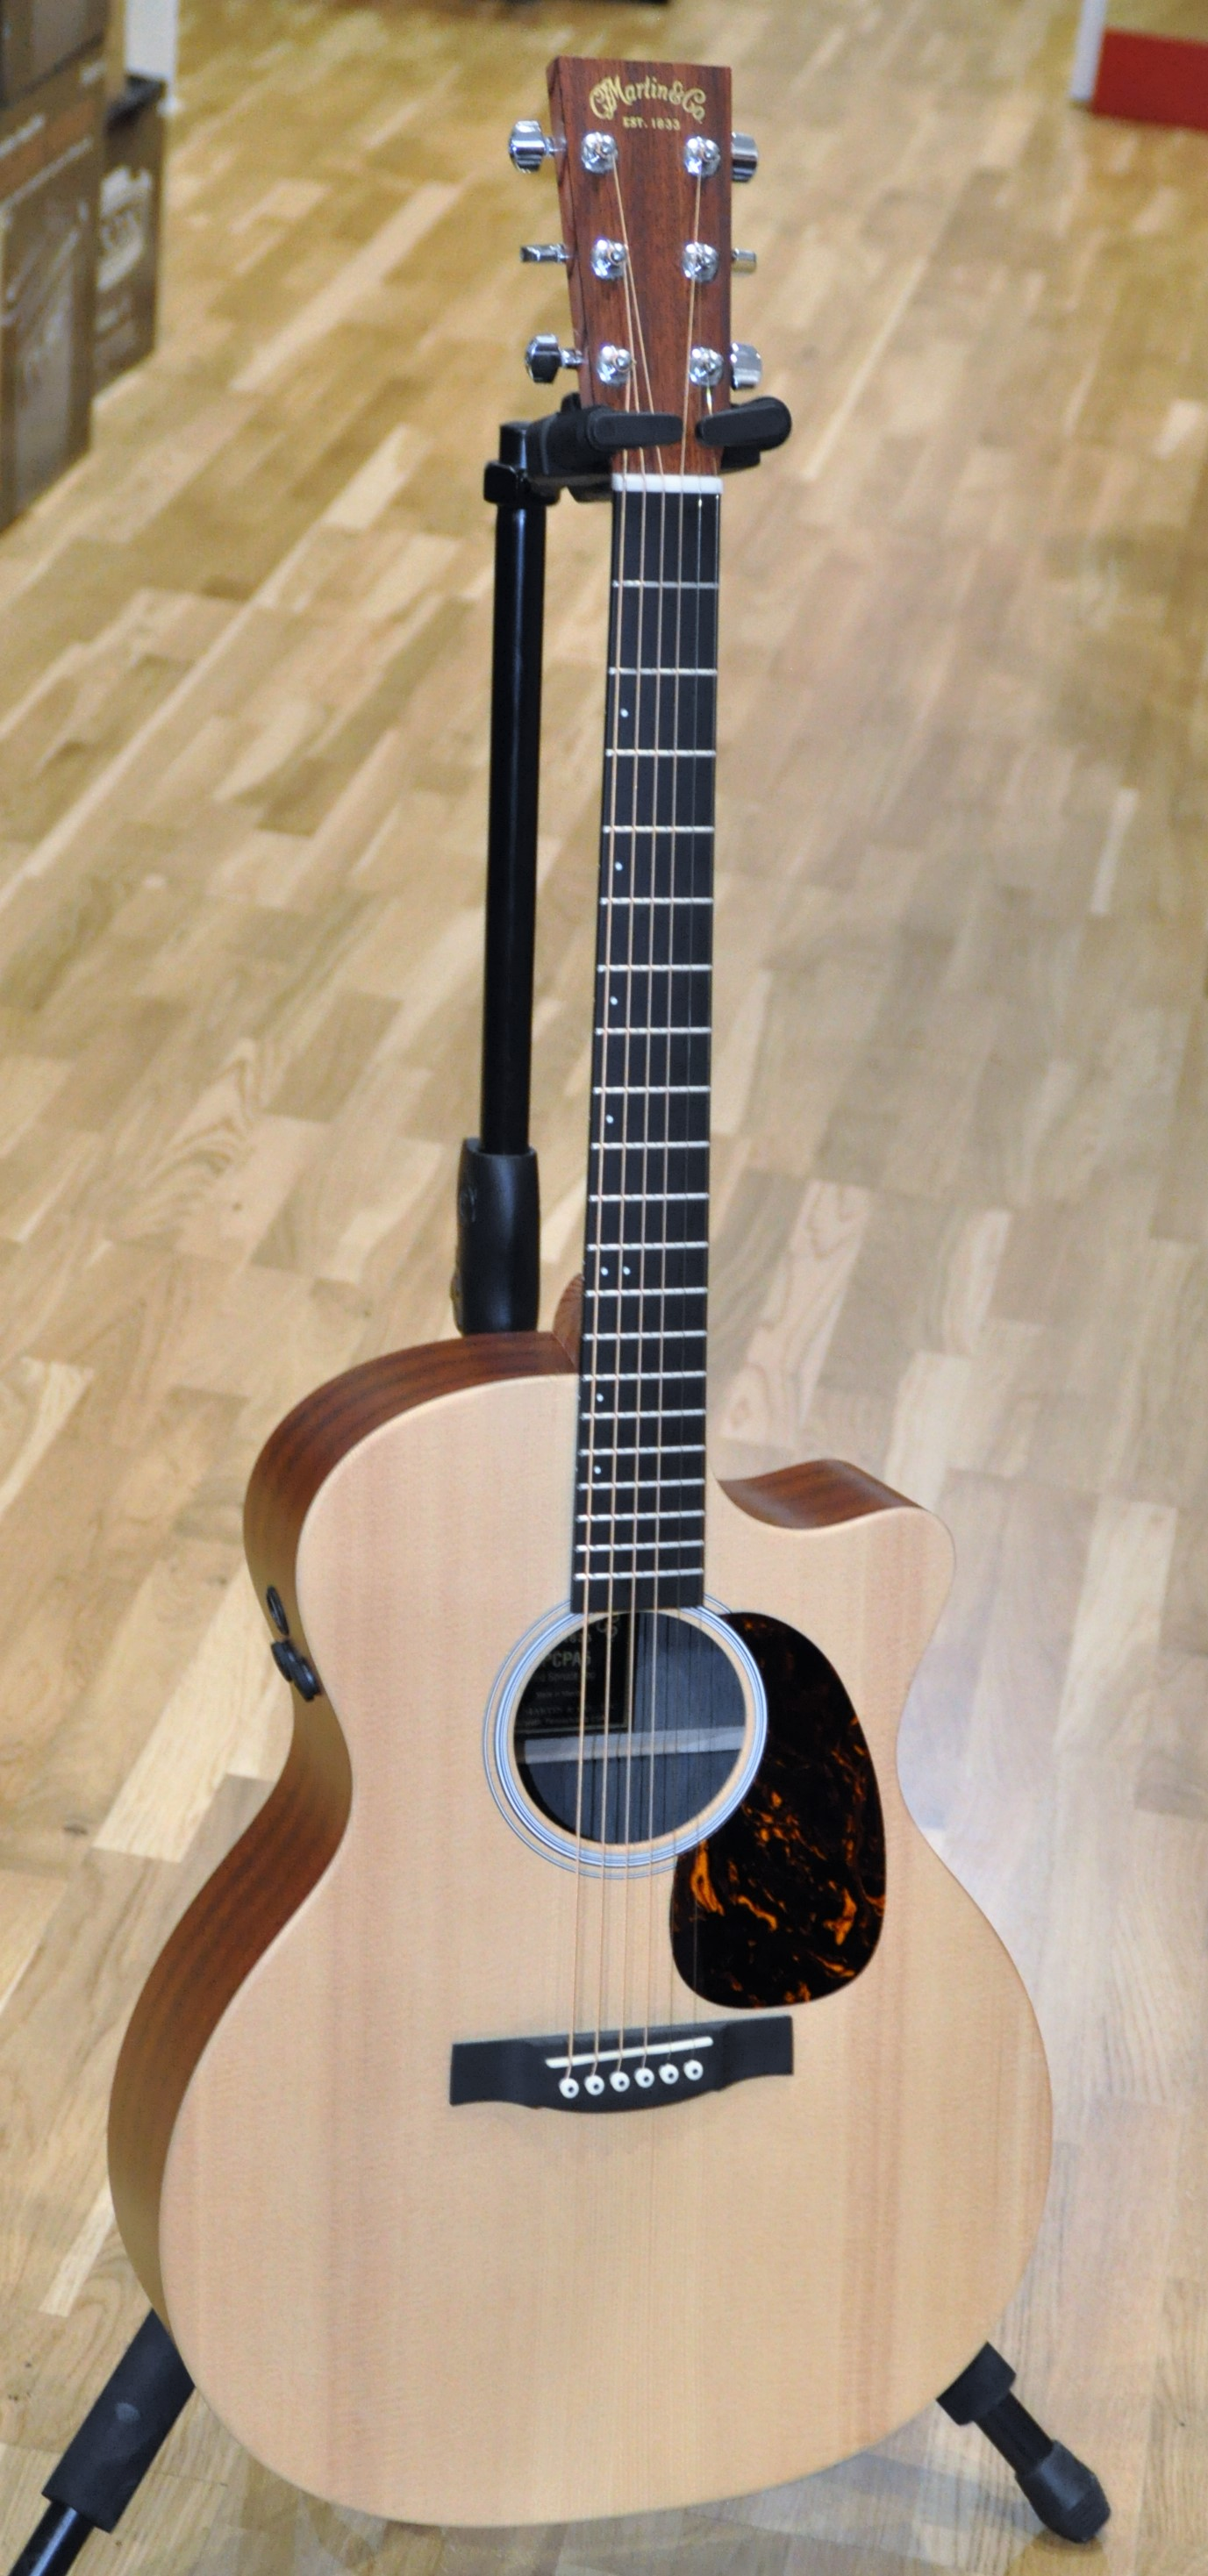 guitare electroacoustique martin co gpcpa5 ile de. Black Bedroom Furniture Sets. Home Design Ideas